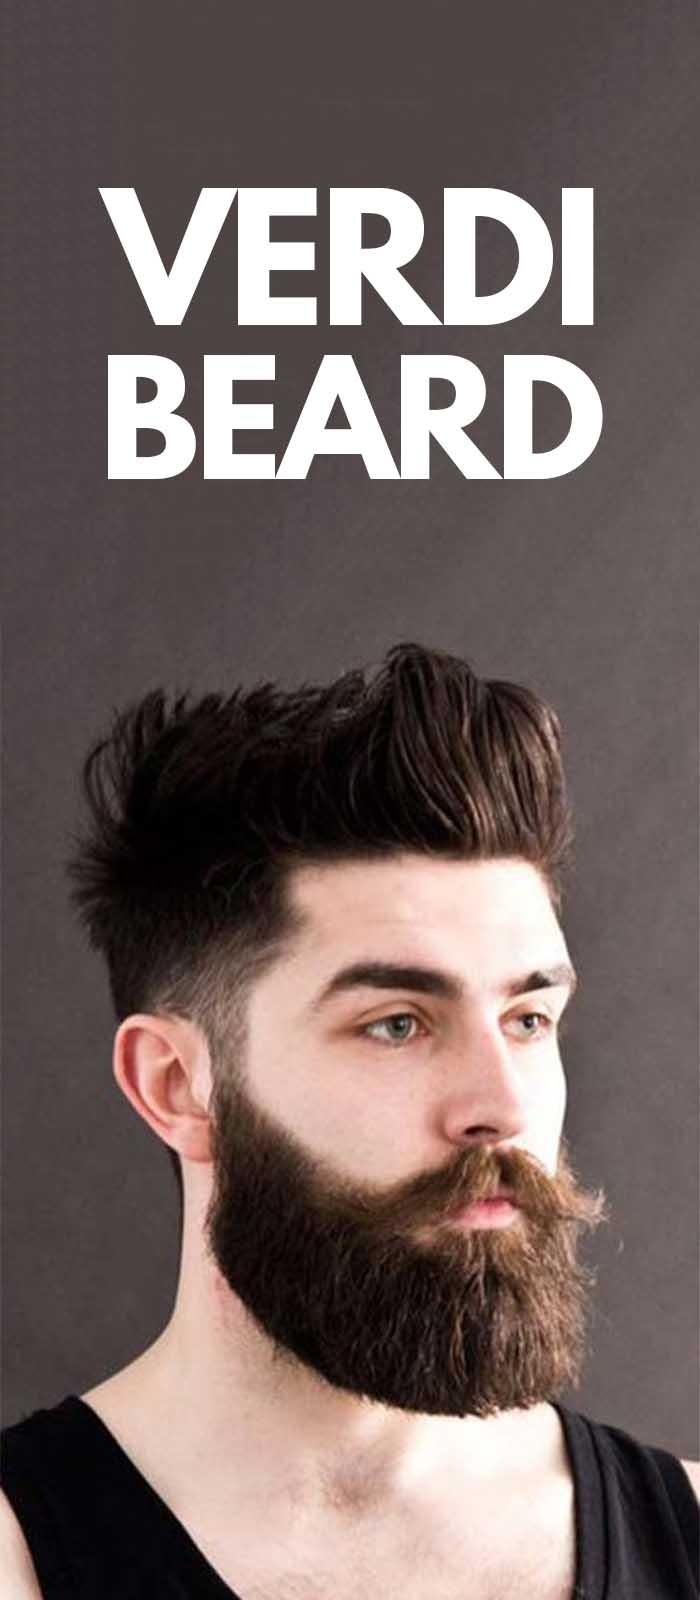 Masculine & Sexy Verdi Beard In Just 5 Steps!